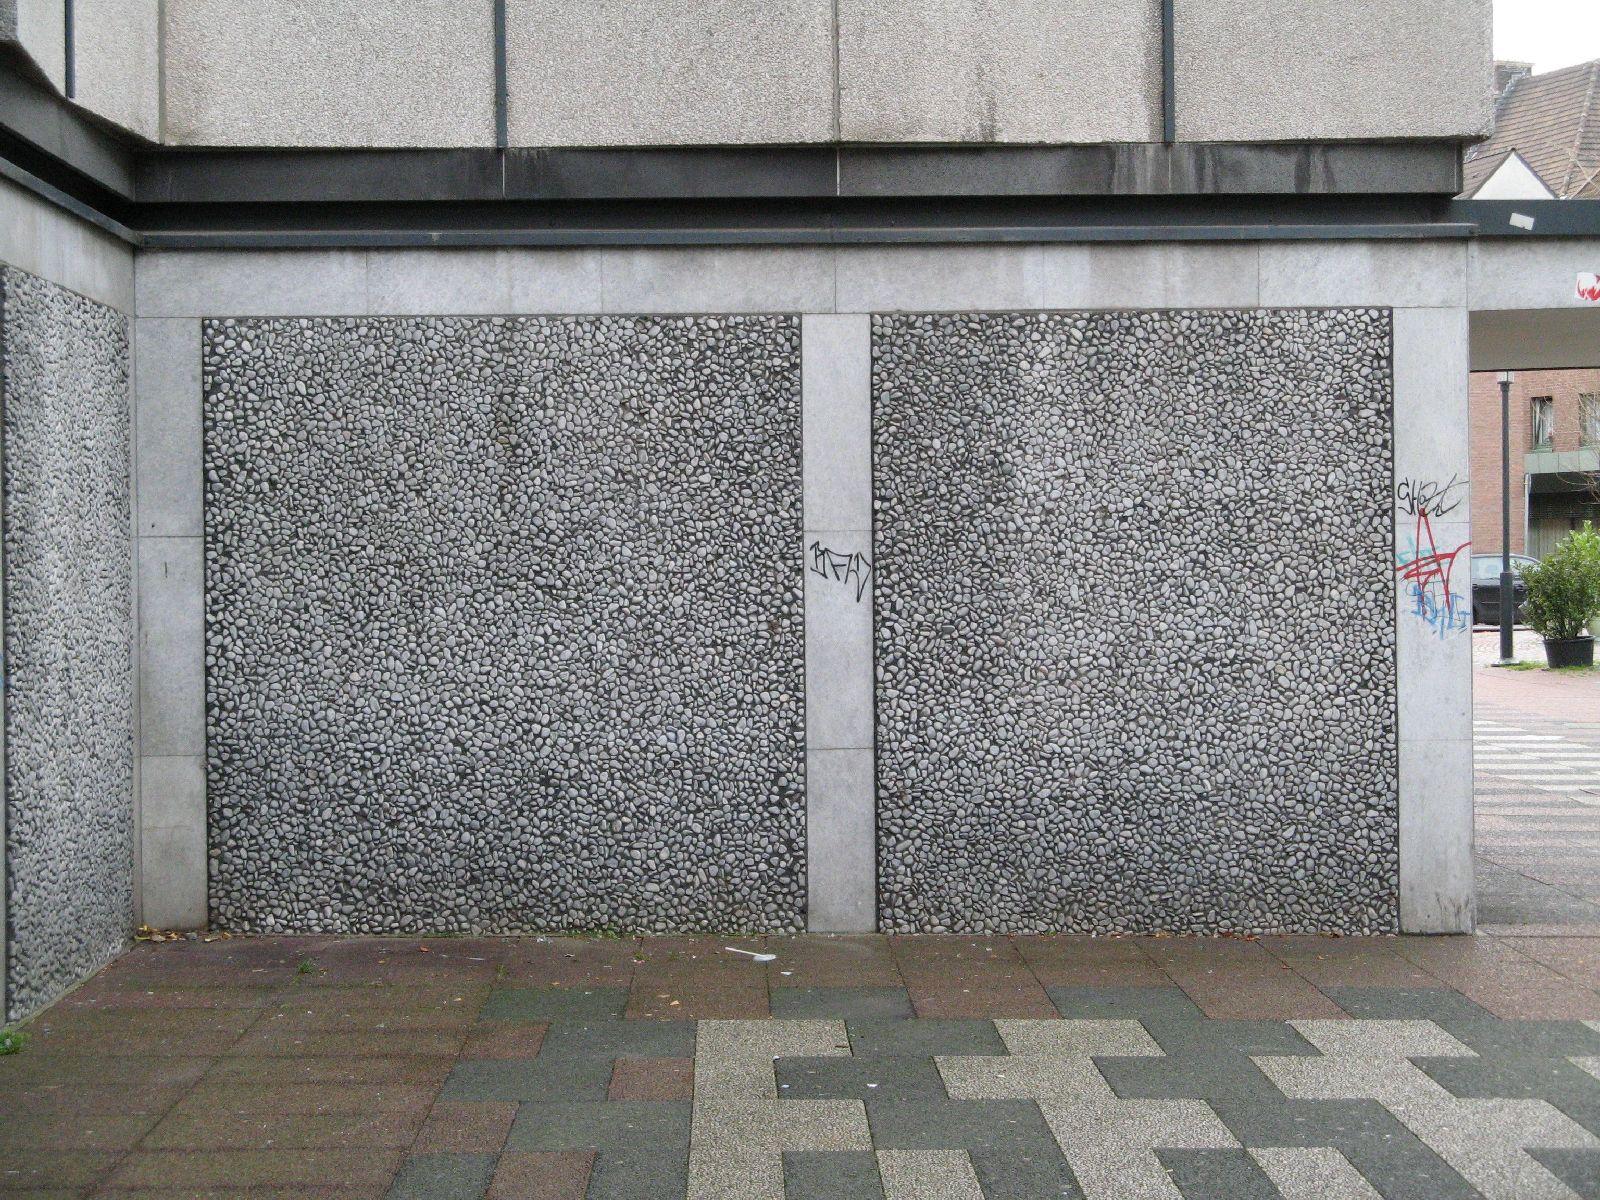 Gebaeude-Architektur_Textur_B_02433